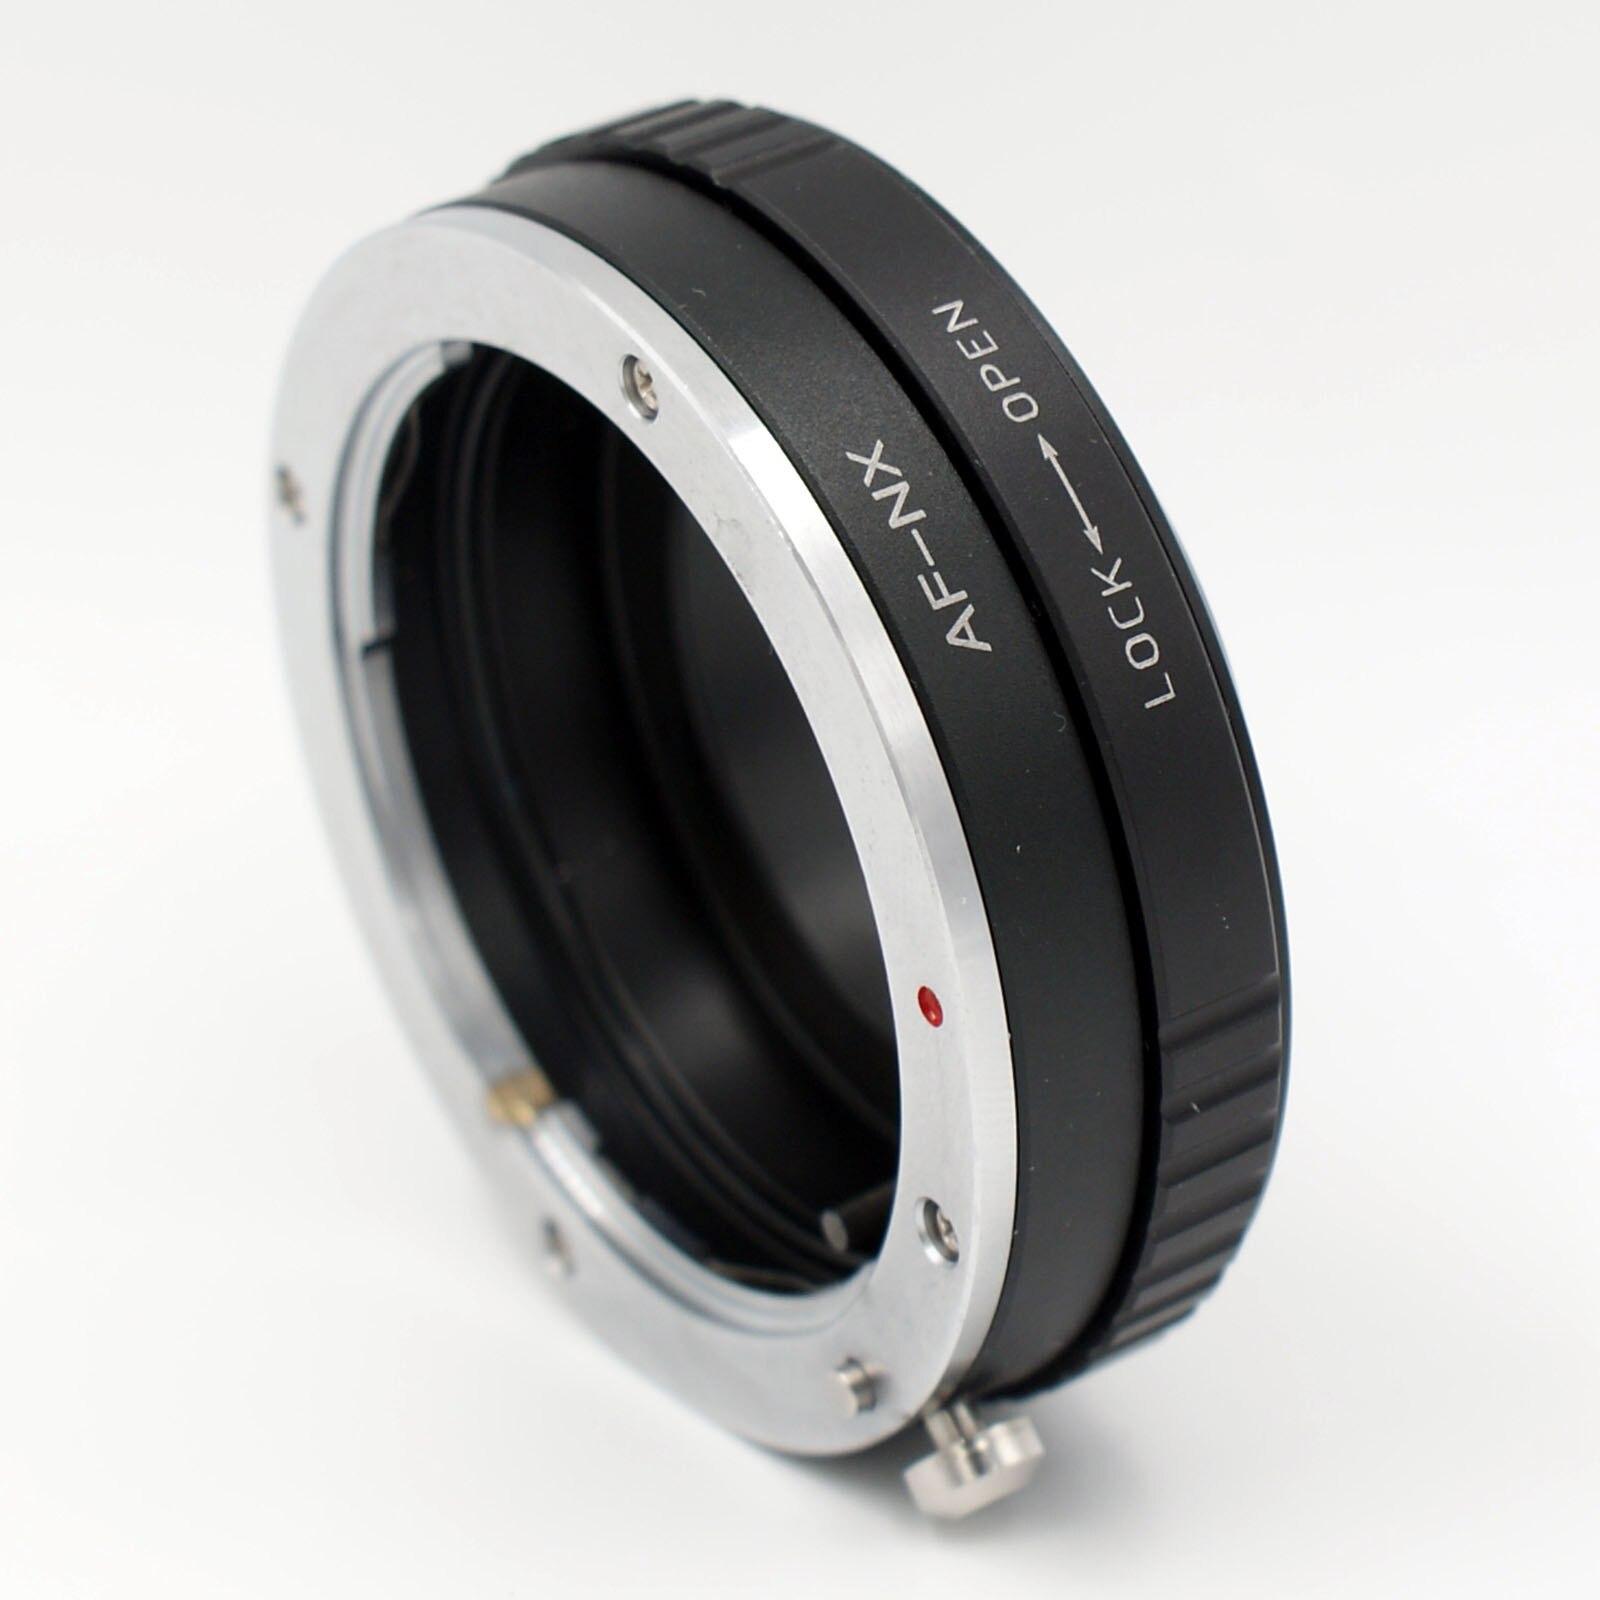 Anillo adaptador para sony A Alpha Minolta AF MA lente de montaje A samsung NX NX5 NX10 NX11 NX100 NX200 Cámara